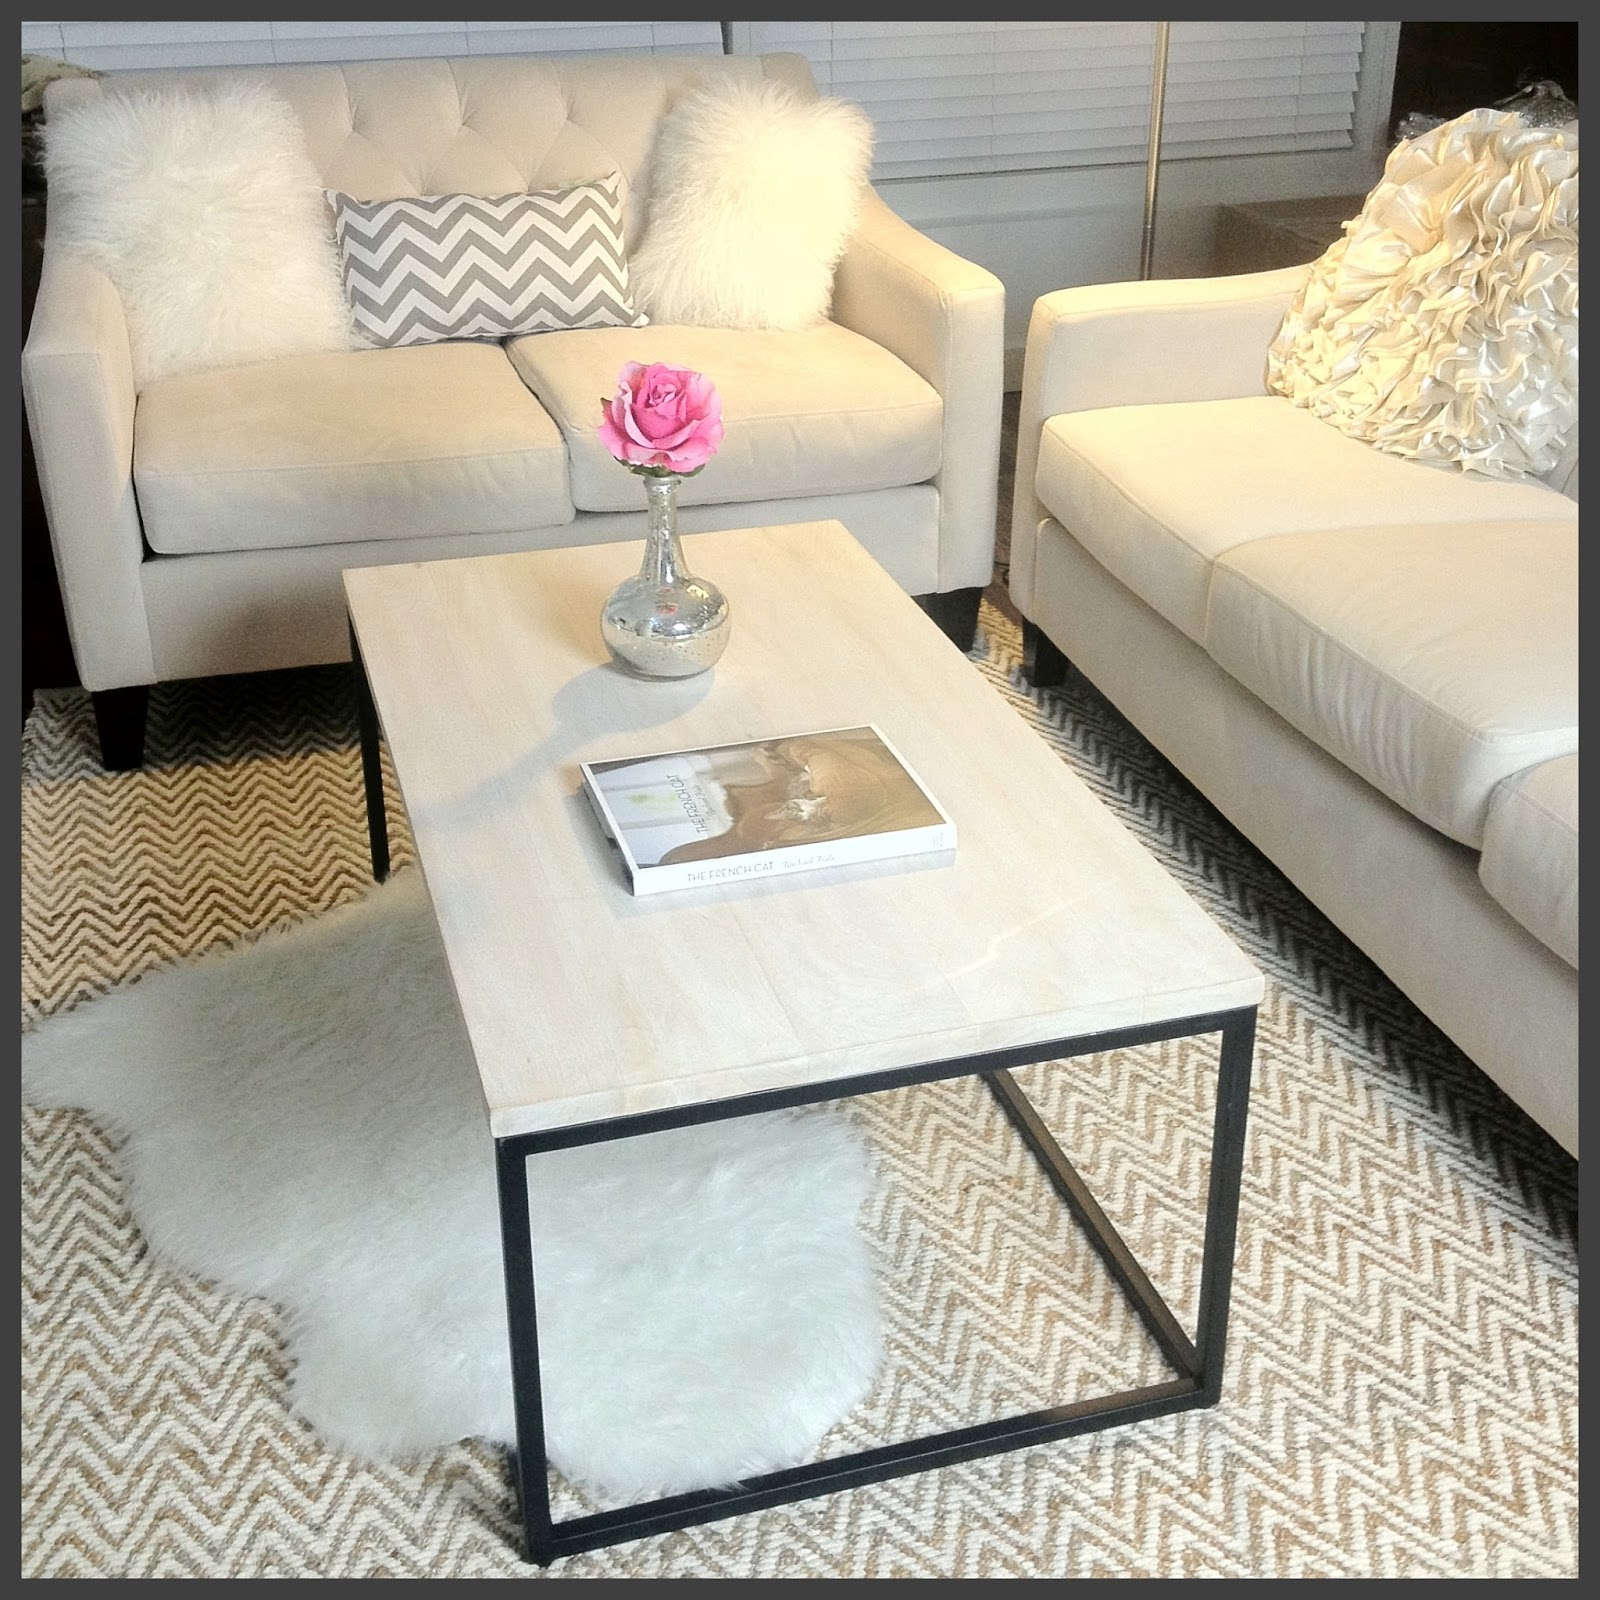 I Heart You Coffee: Dollhouse: My New Coffee Table